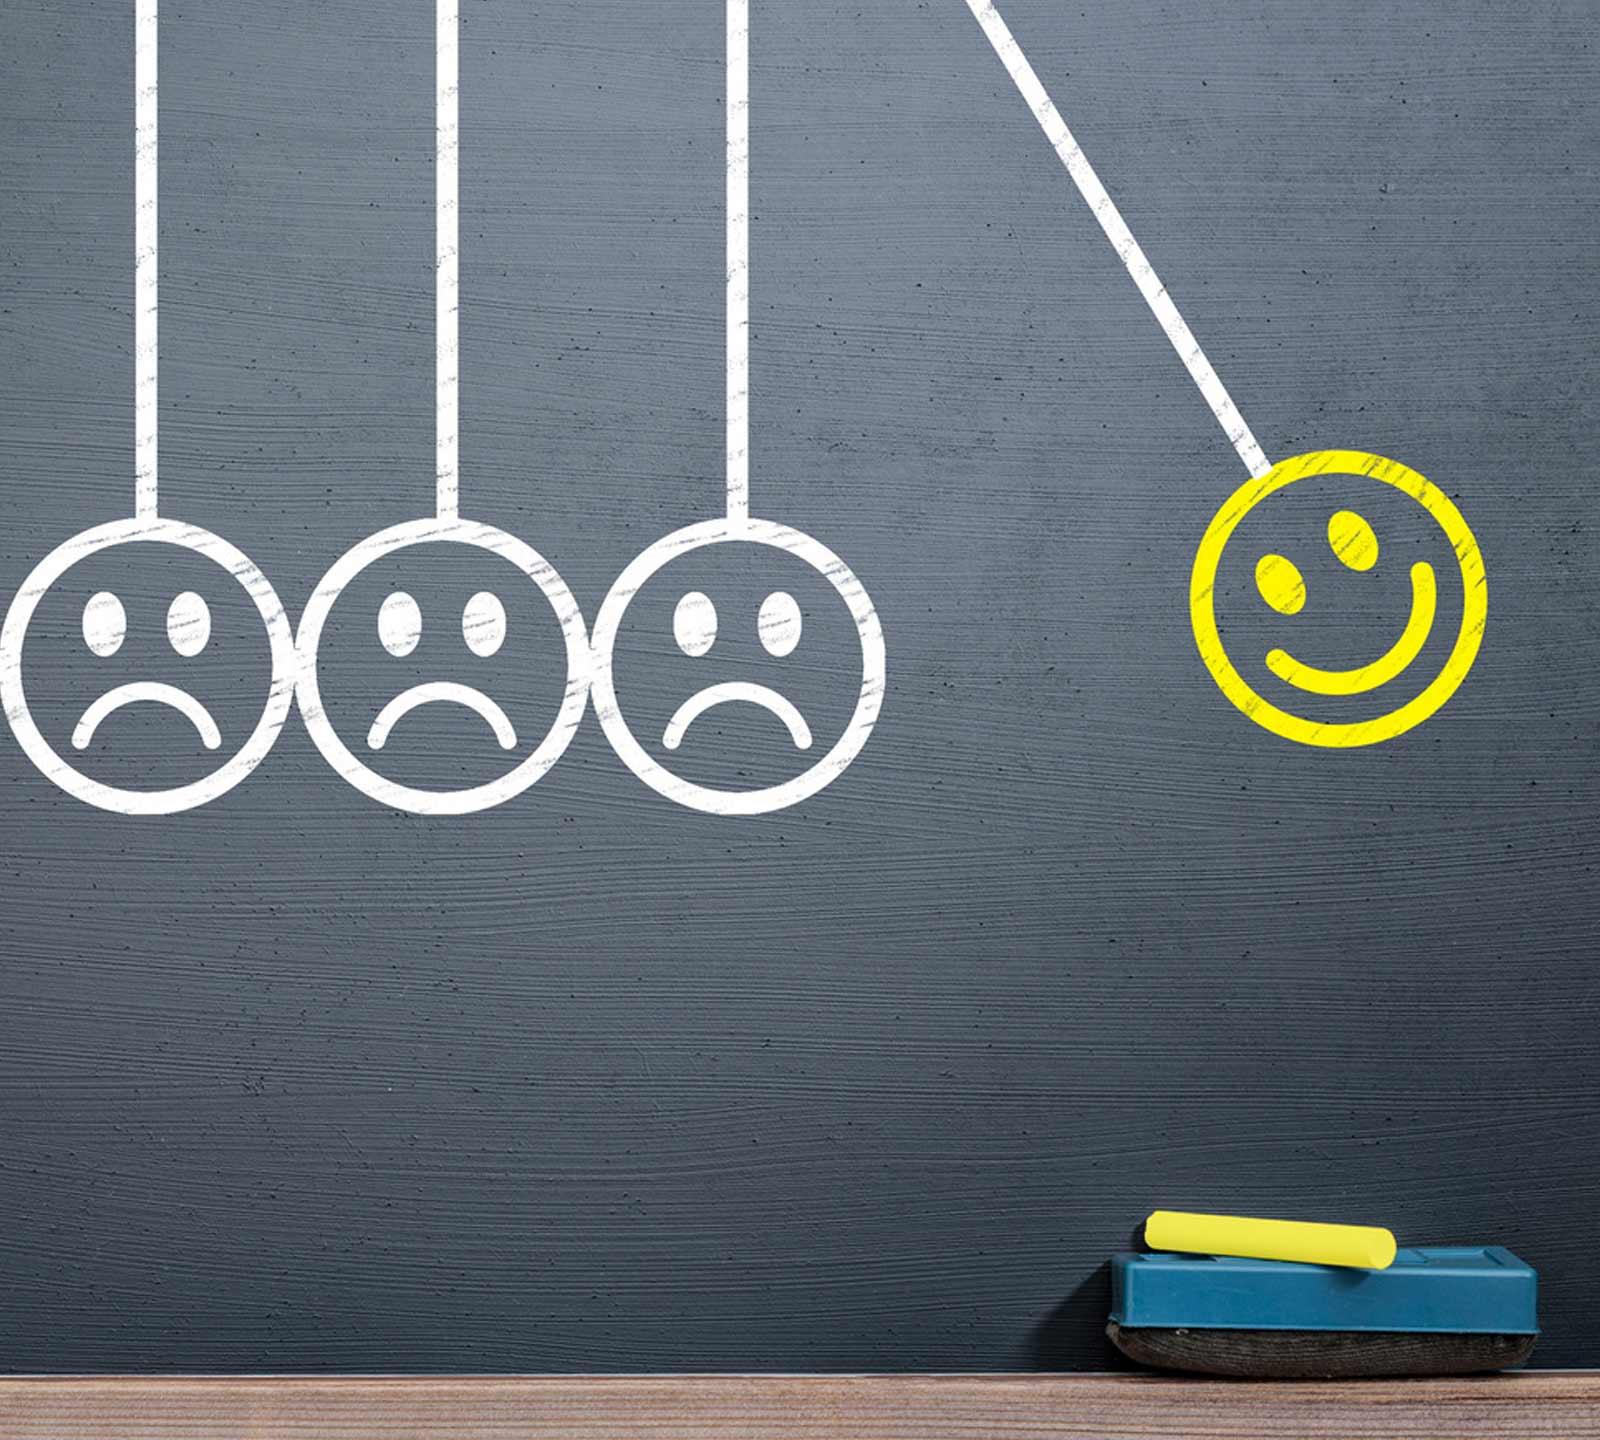 Understanding evolving customer needs and preparing ahead to respond